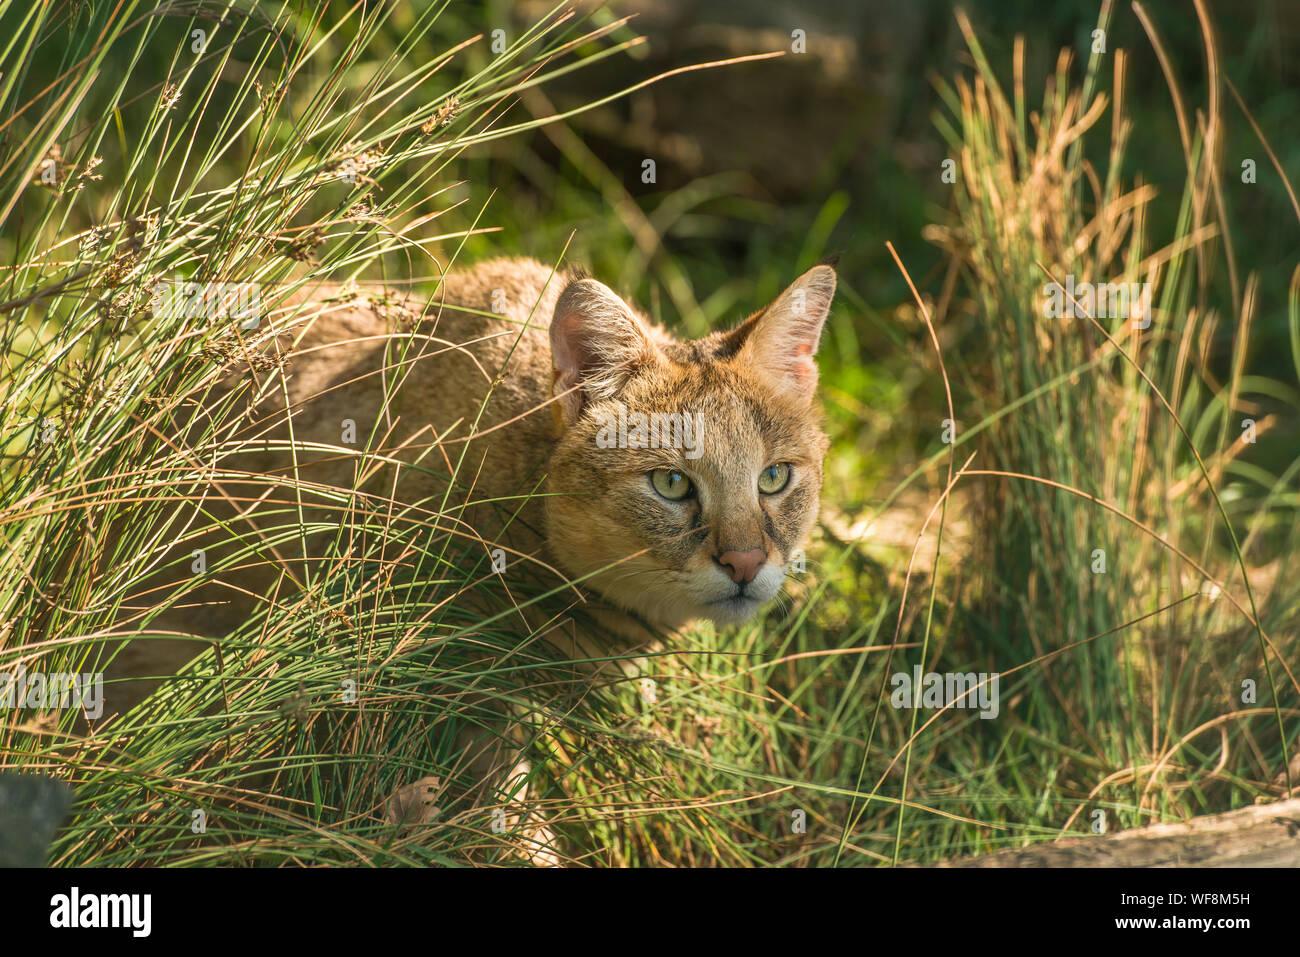 Close-up Of Undomesticated Cat On Grassy Field Stock Photo